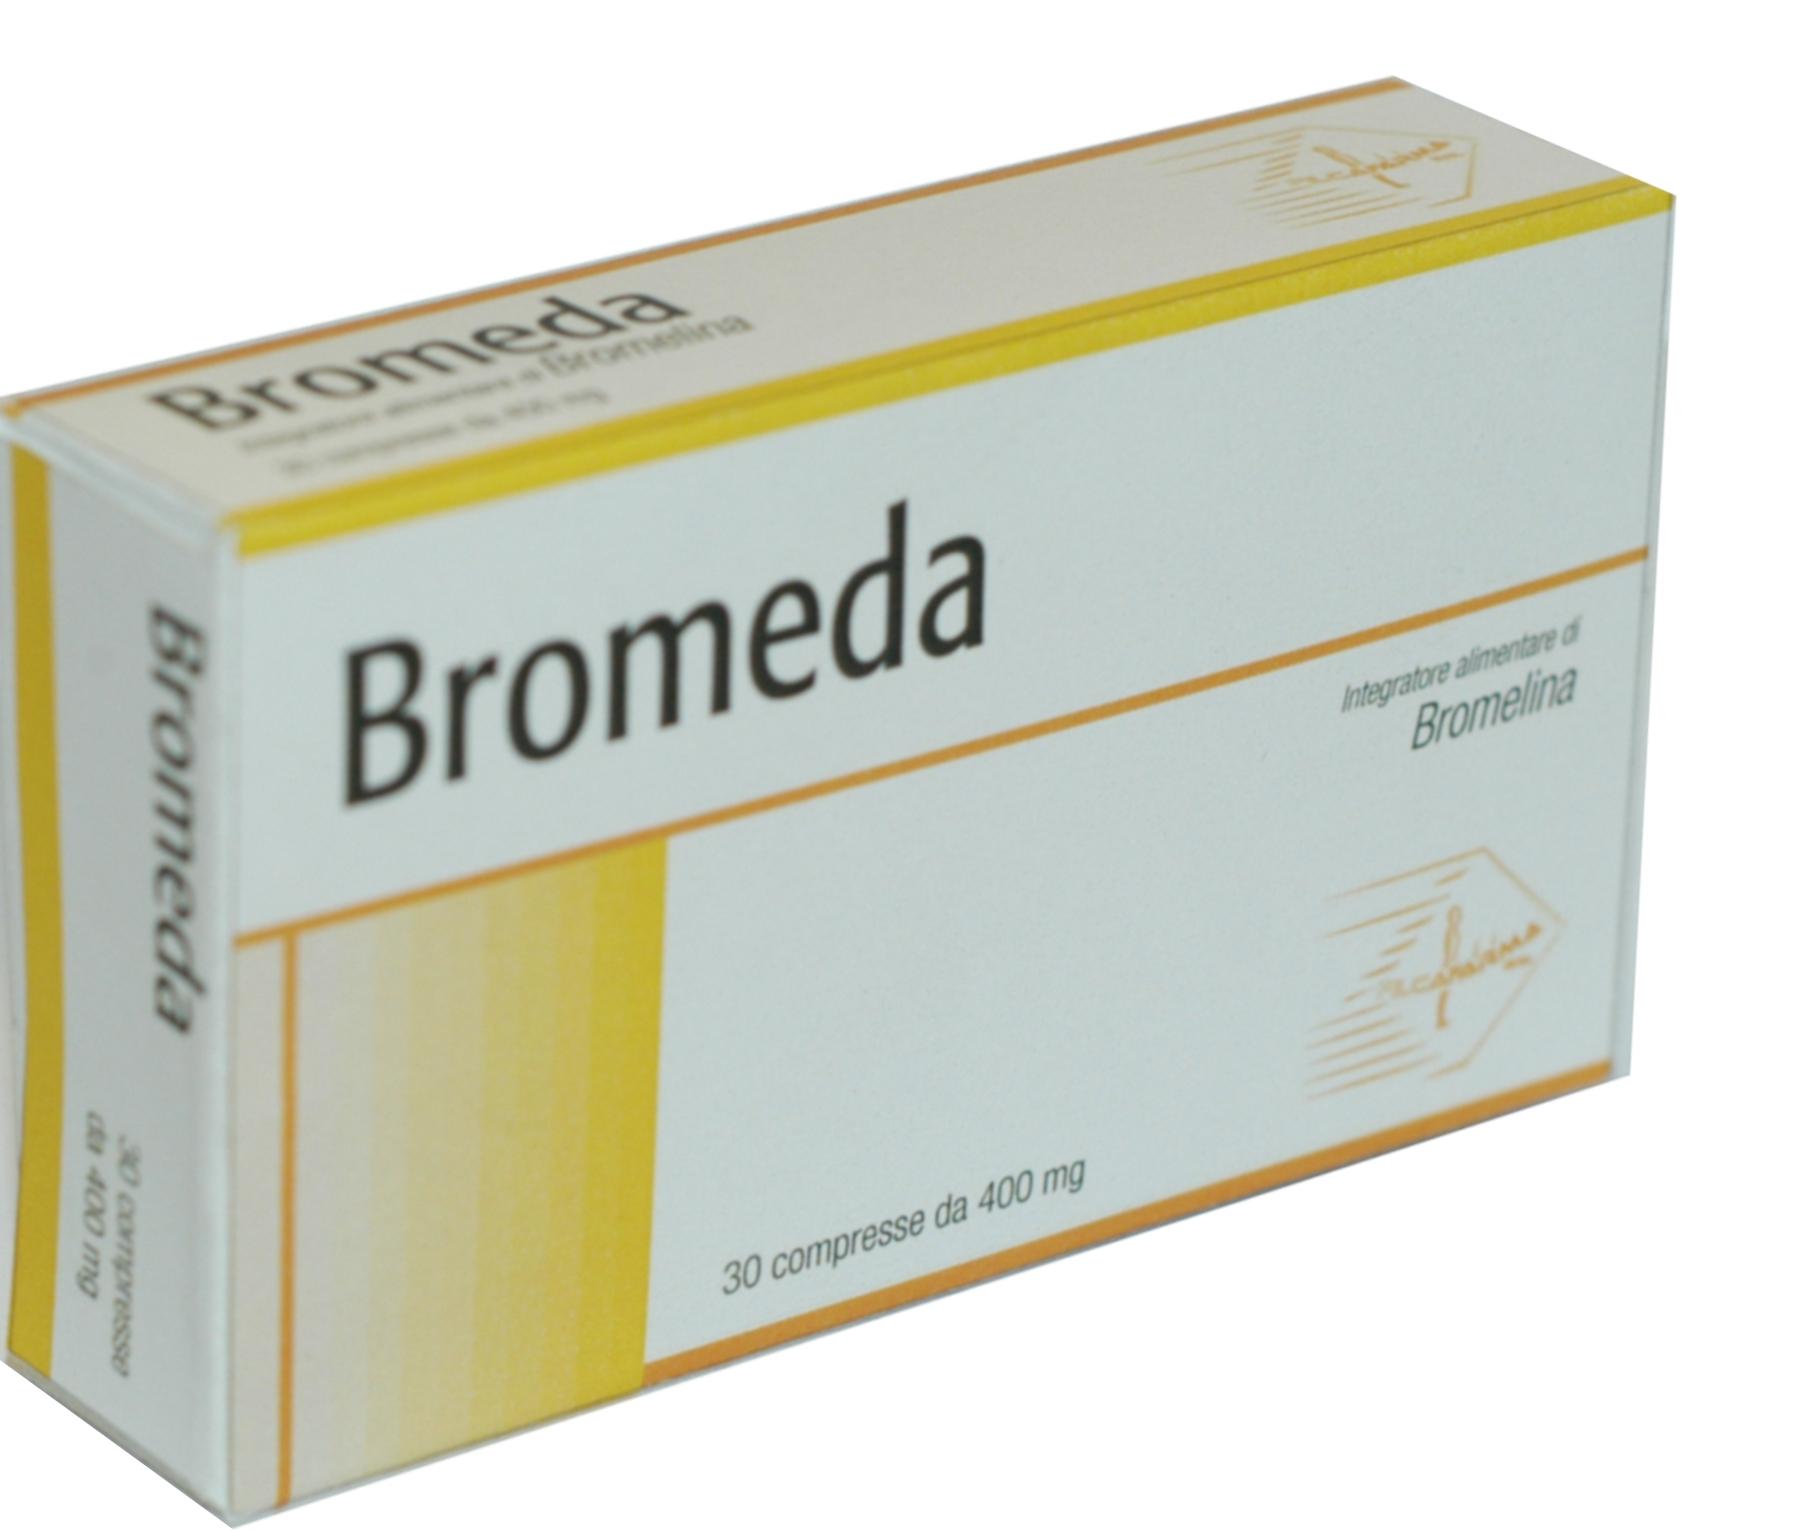 Filca Farma Bromeda Gel Integratore Alimentare 40ml